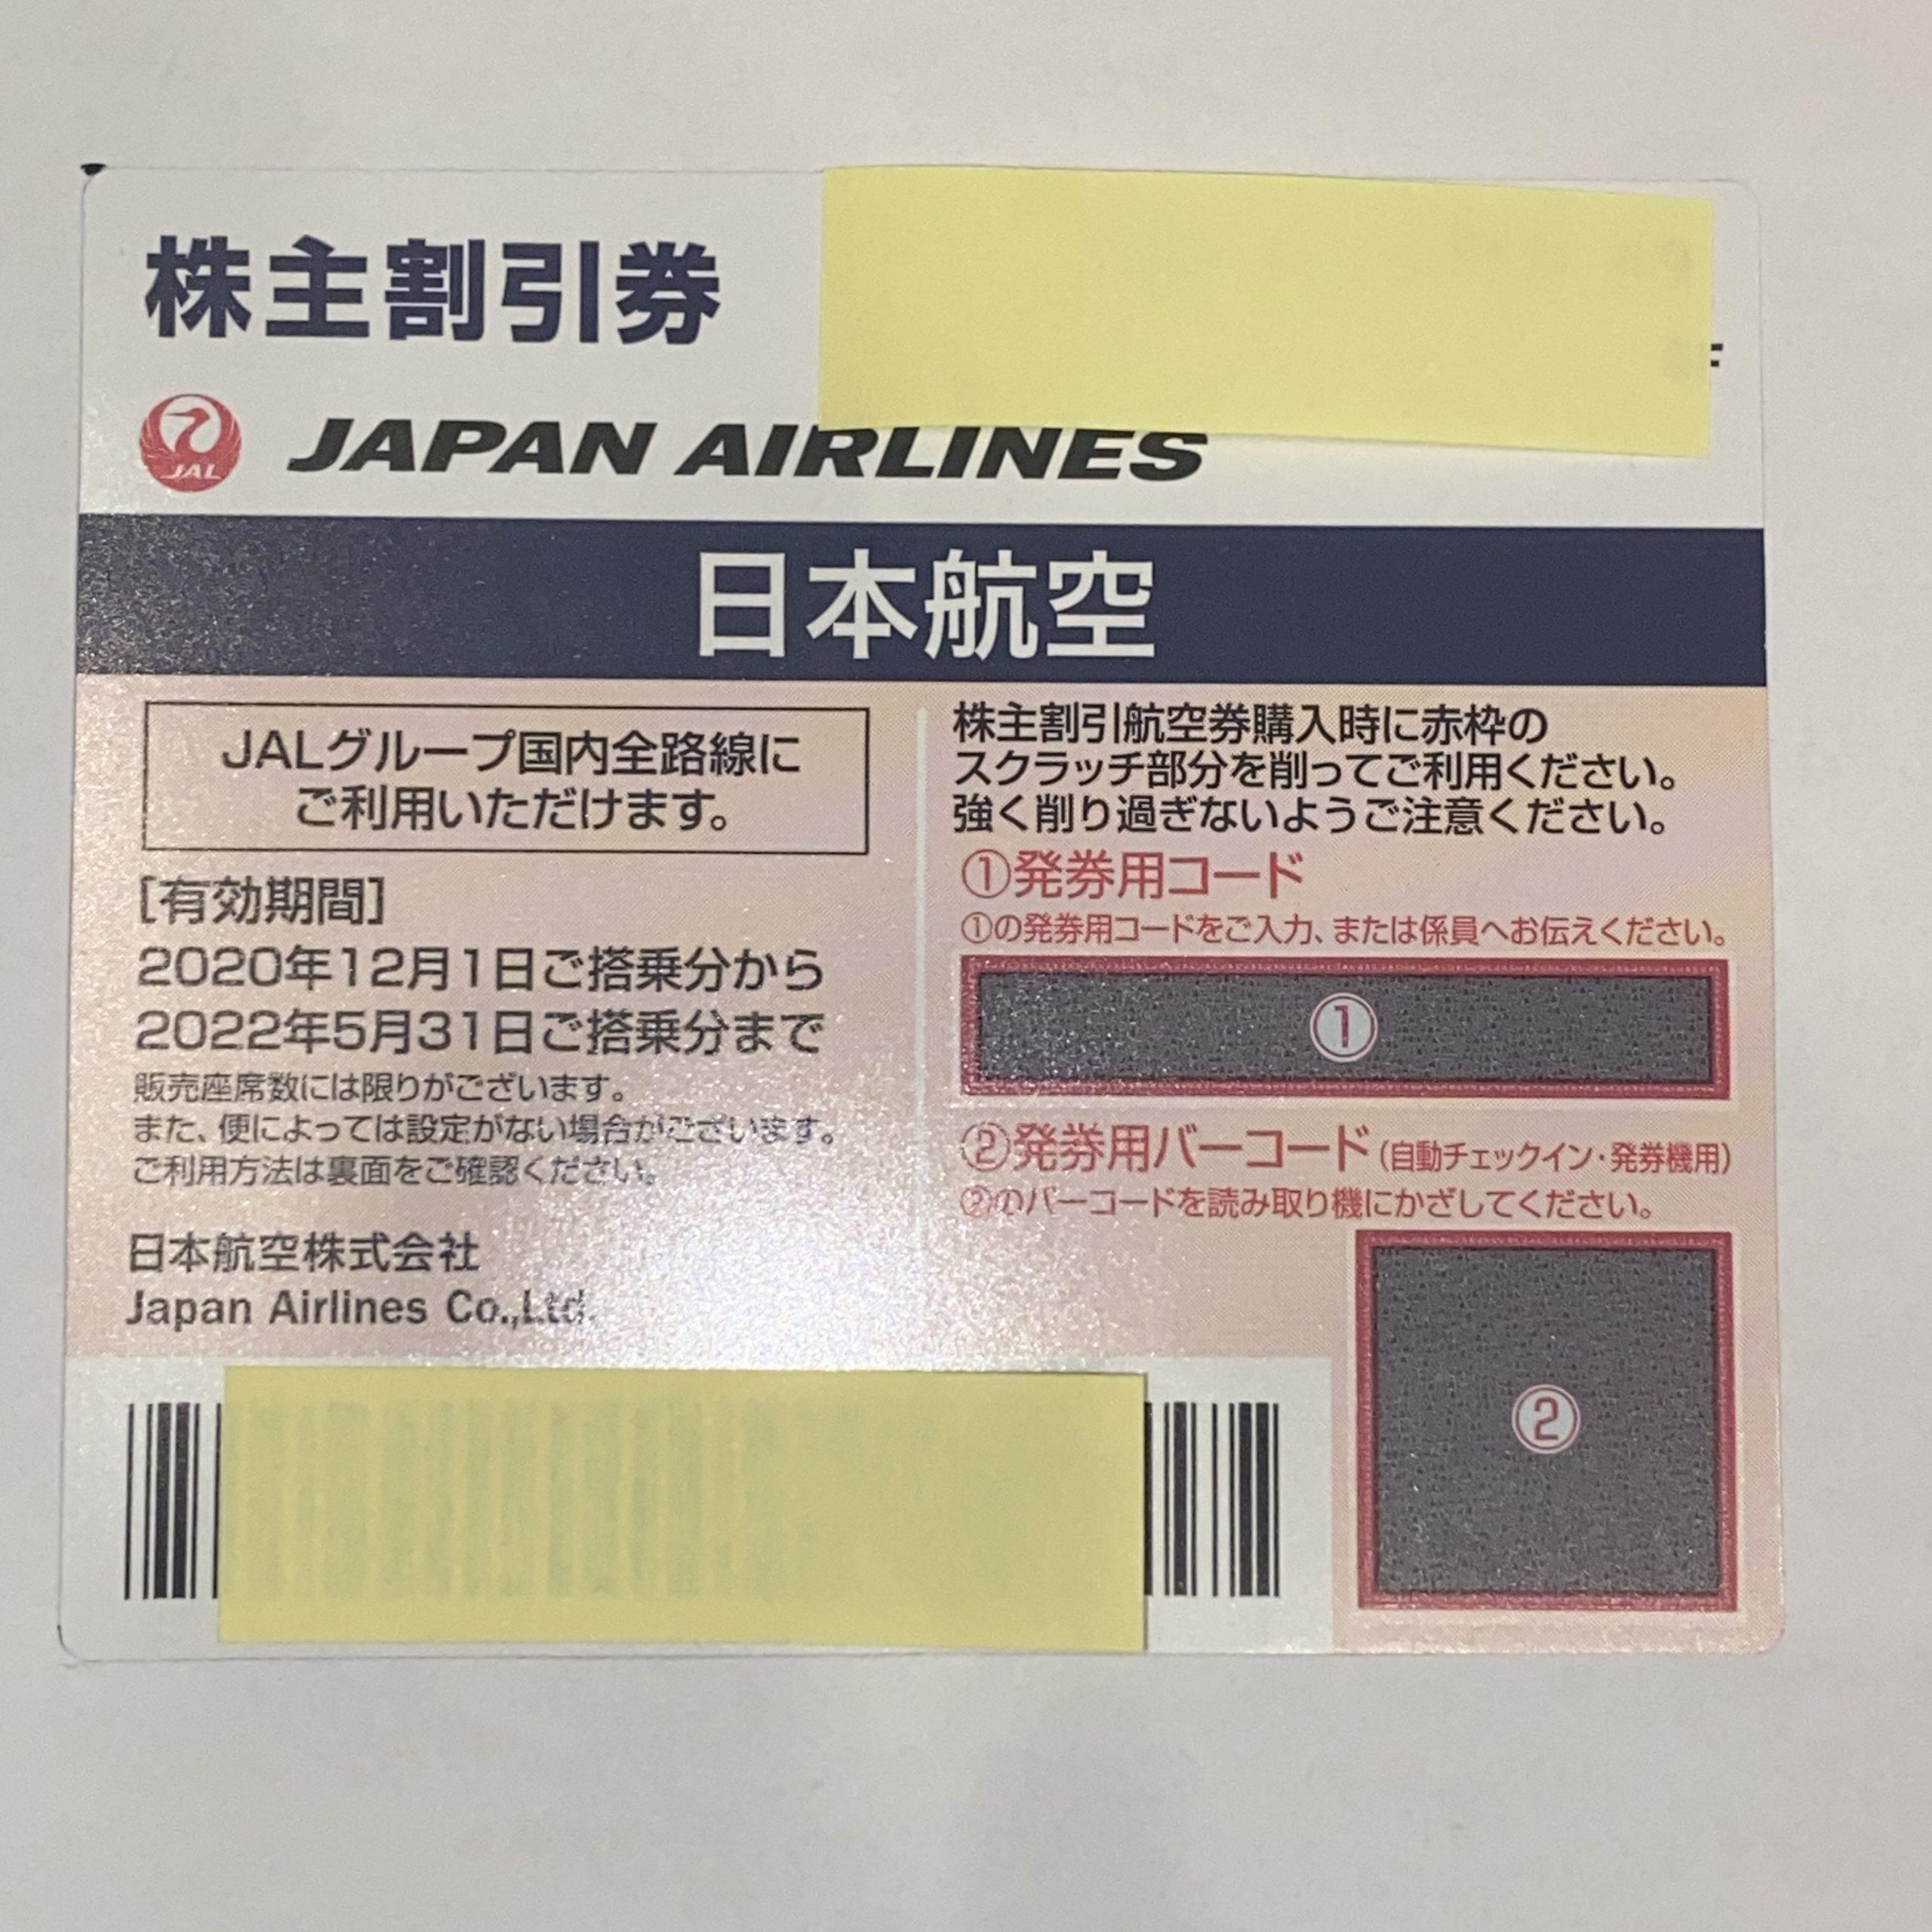 JAL 株主優待券 2022年5月31日まで